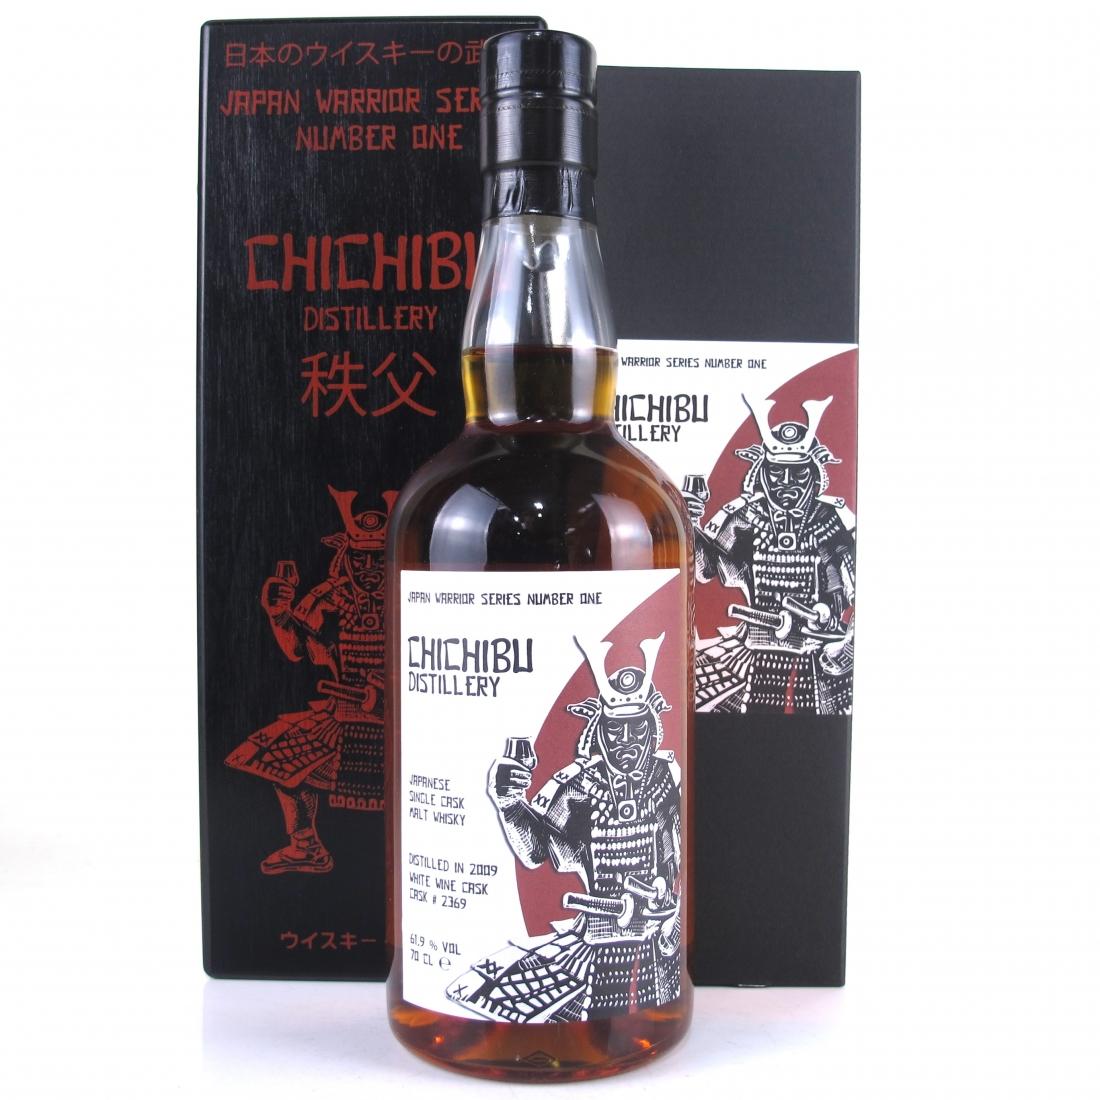 Chichibu 2009 Ichiro's Malt Single Cask #2369 / Warrior Series No. 1